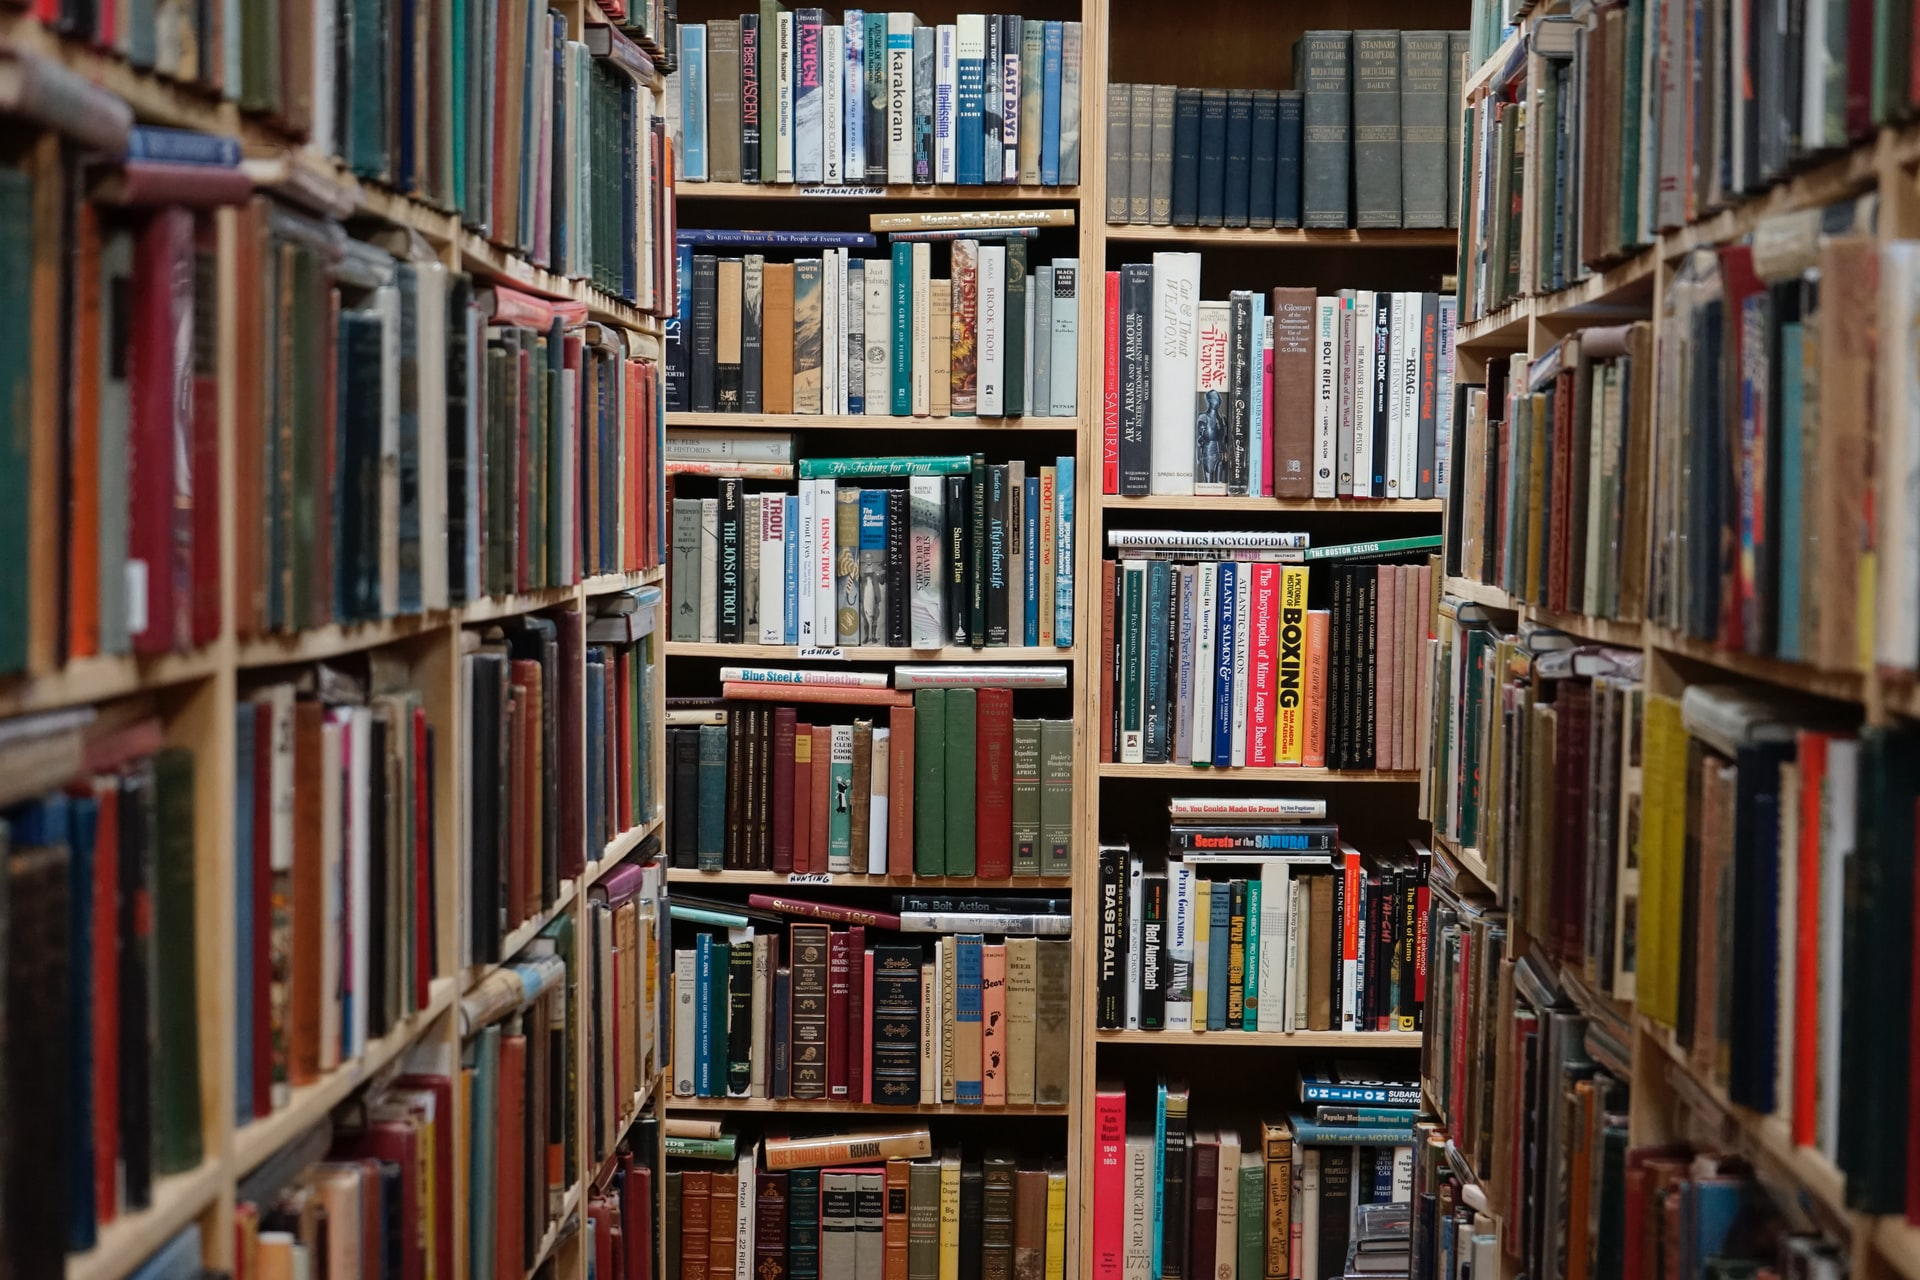 Project Gutenberg Top 100 Books